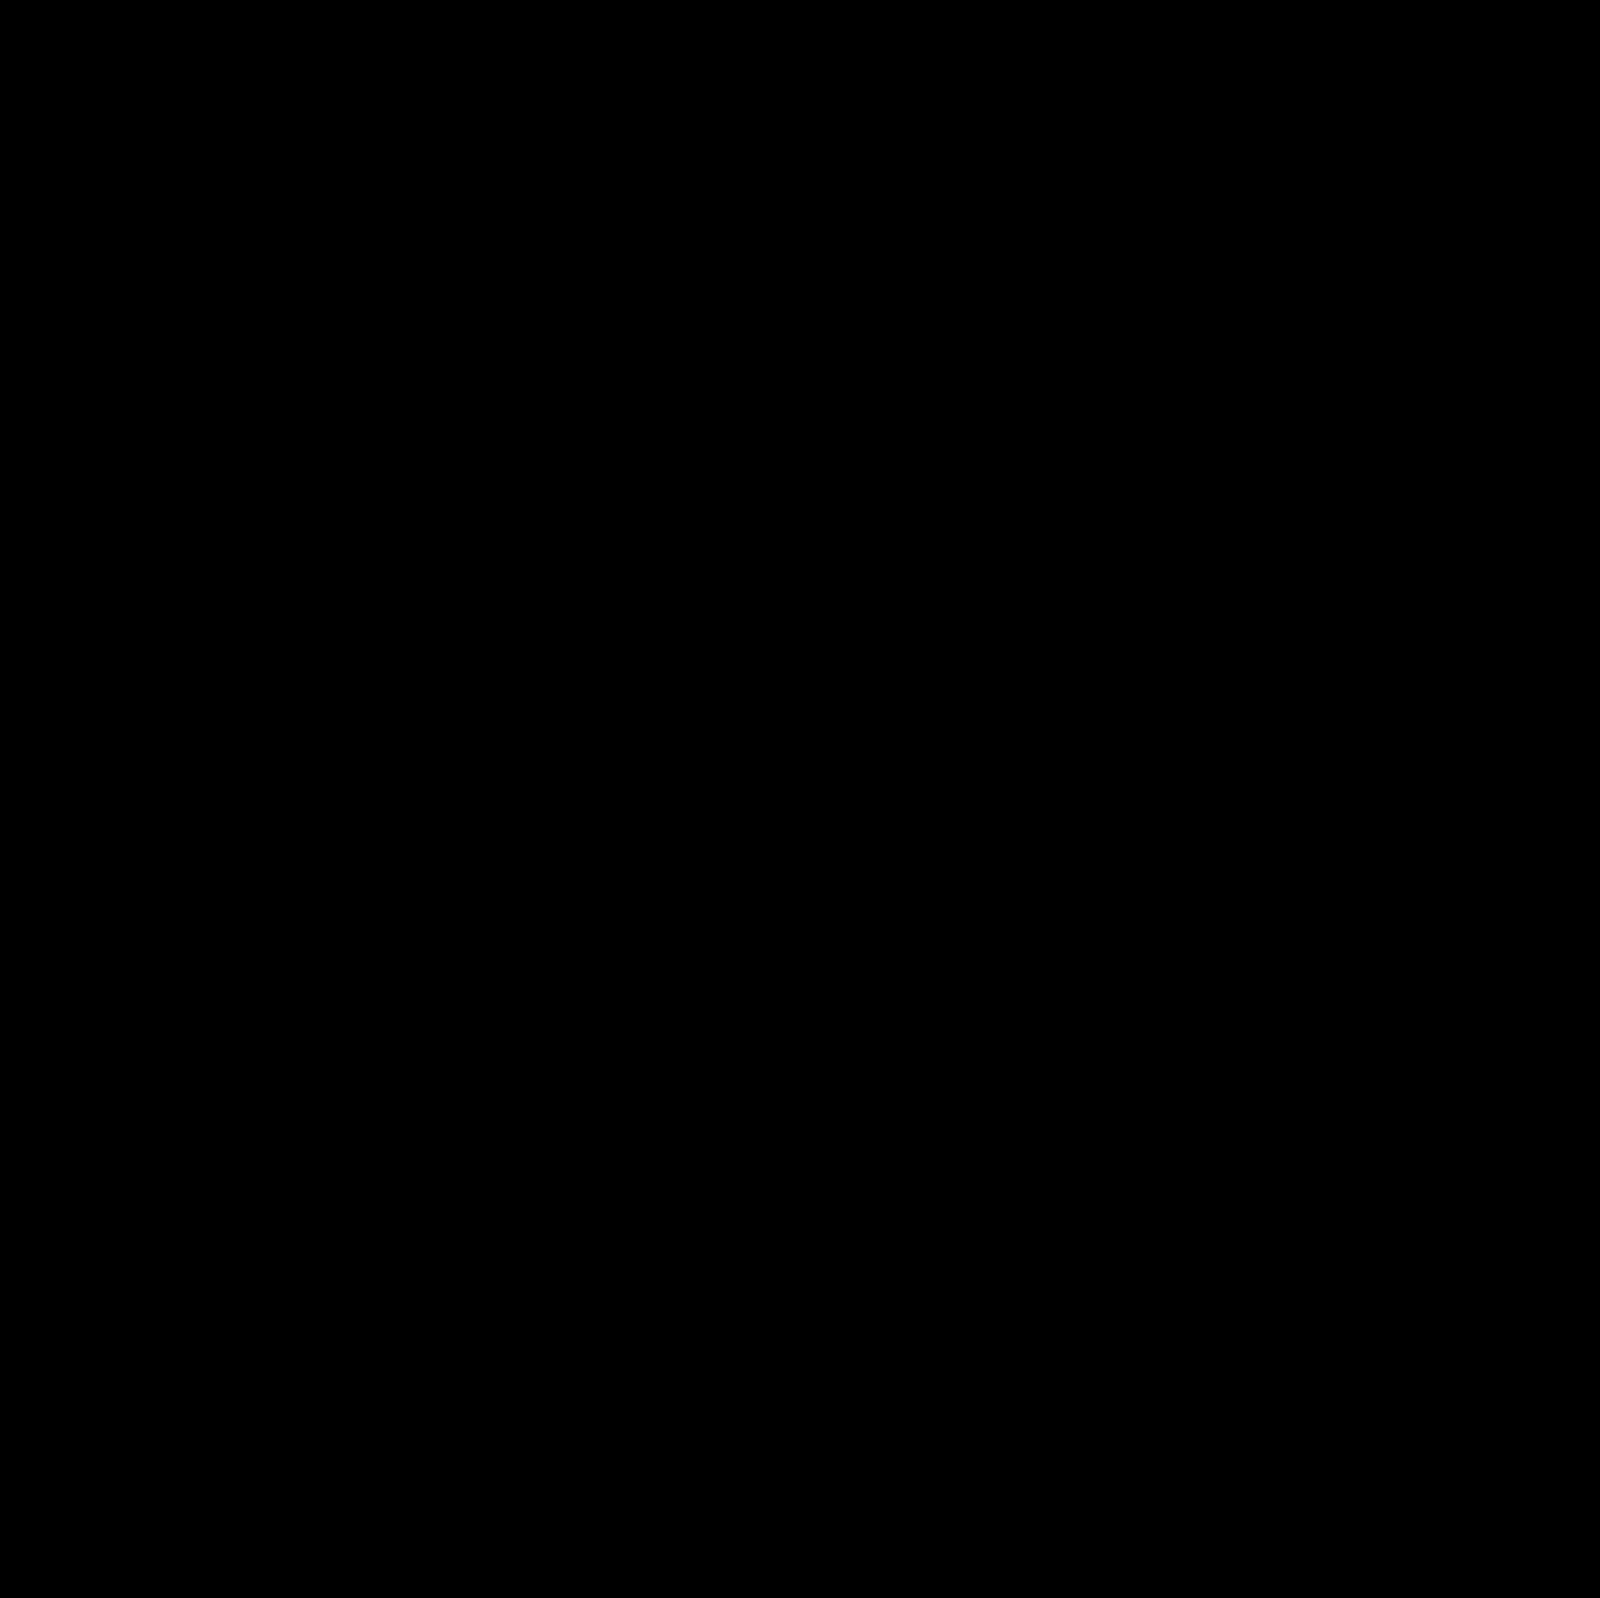 Star wars logo clipart clip stock Image - 1756 - empire insignia logo star wars.png | EAW Wiki ... clip stock